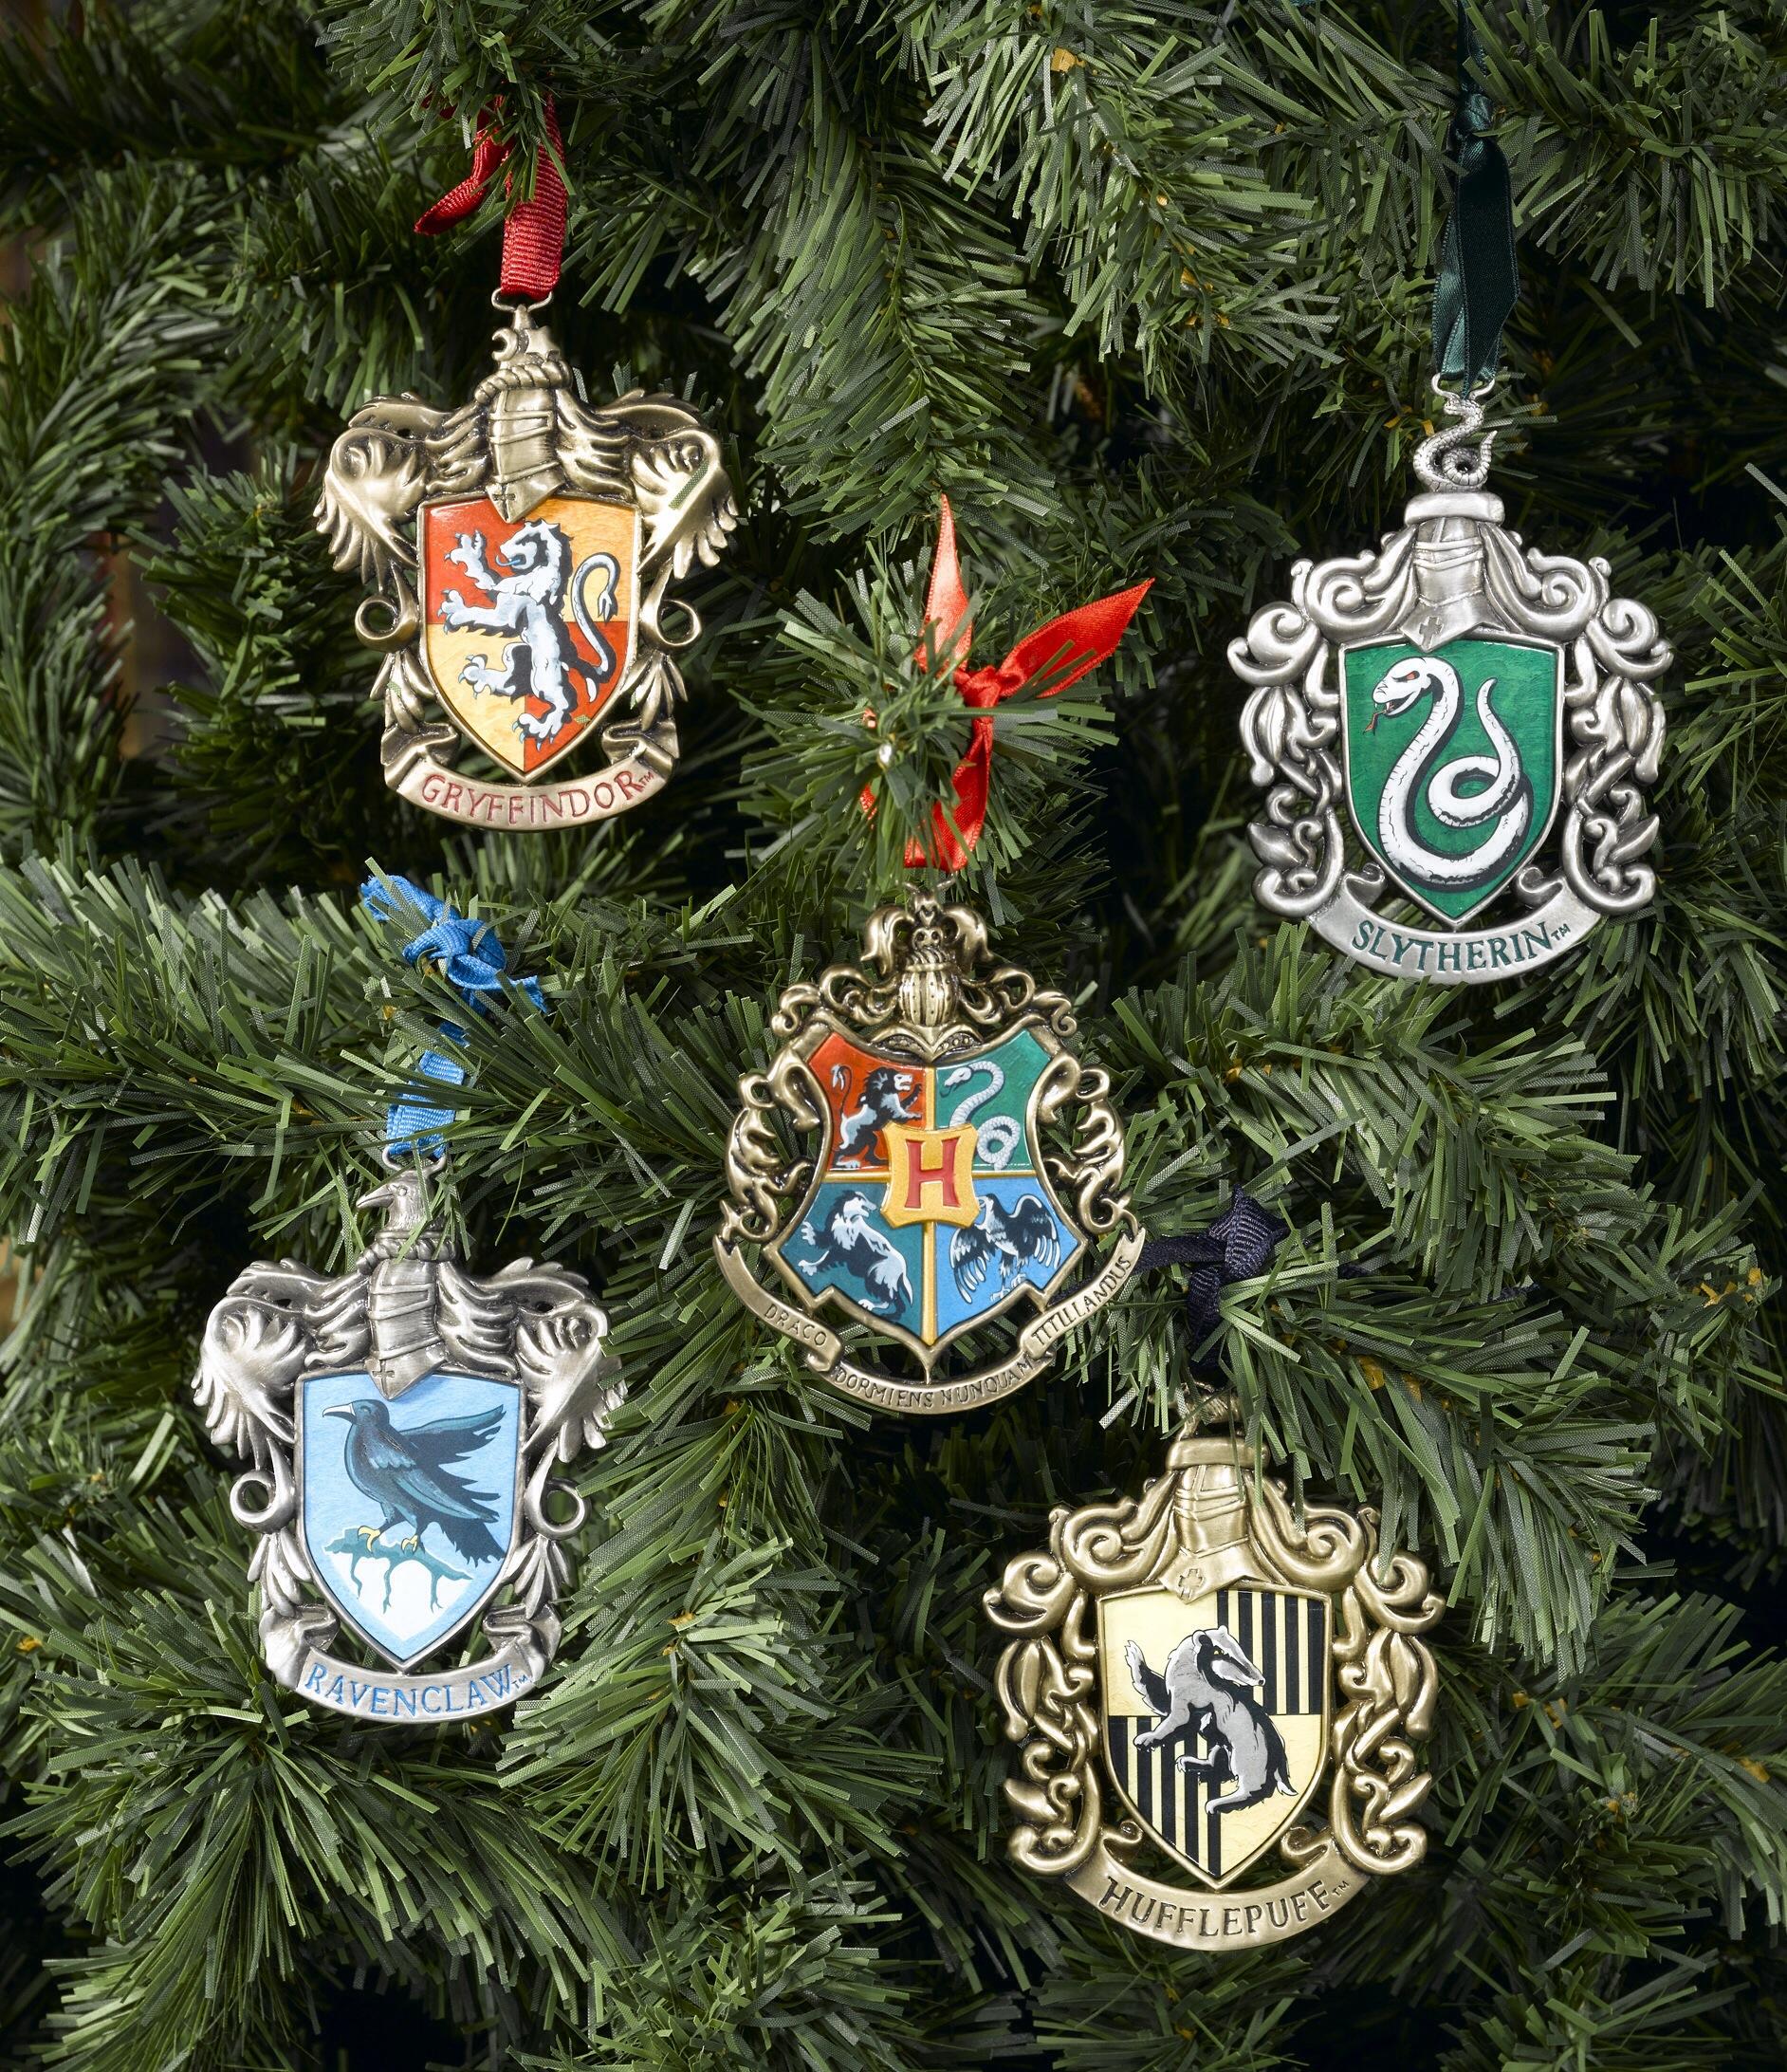 Top 10 Geeky Christmas Ornaments Nerdy Ninja Platypus